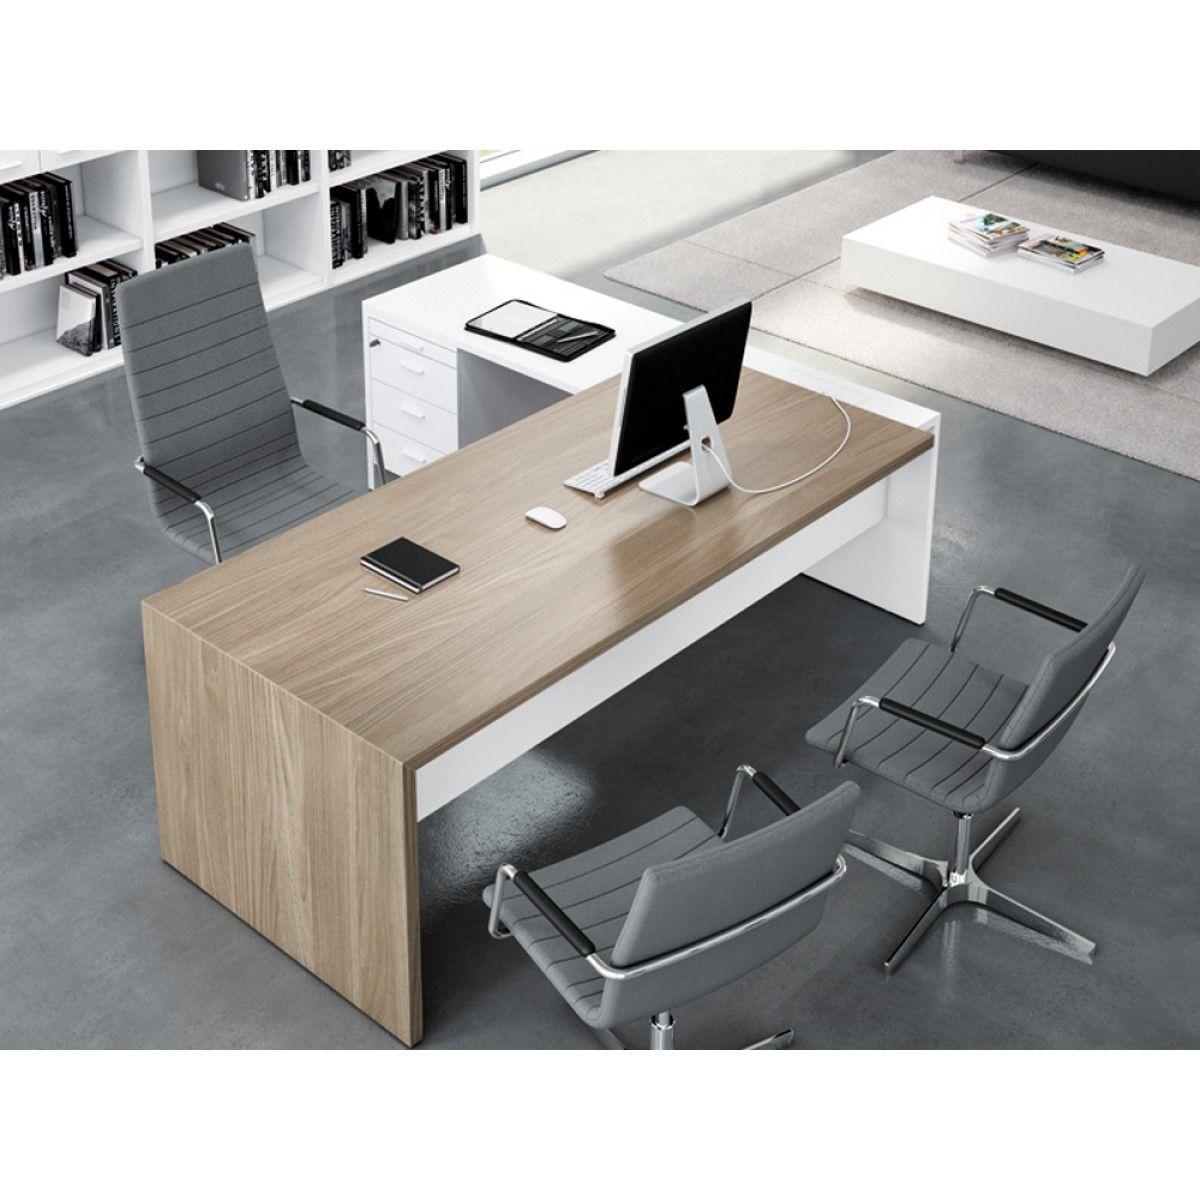 T45 09 In 2020 Modern Office Desk Modern Office Design Office